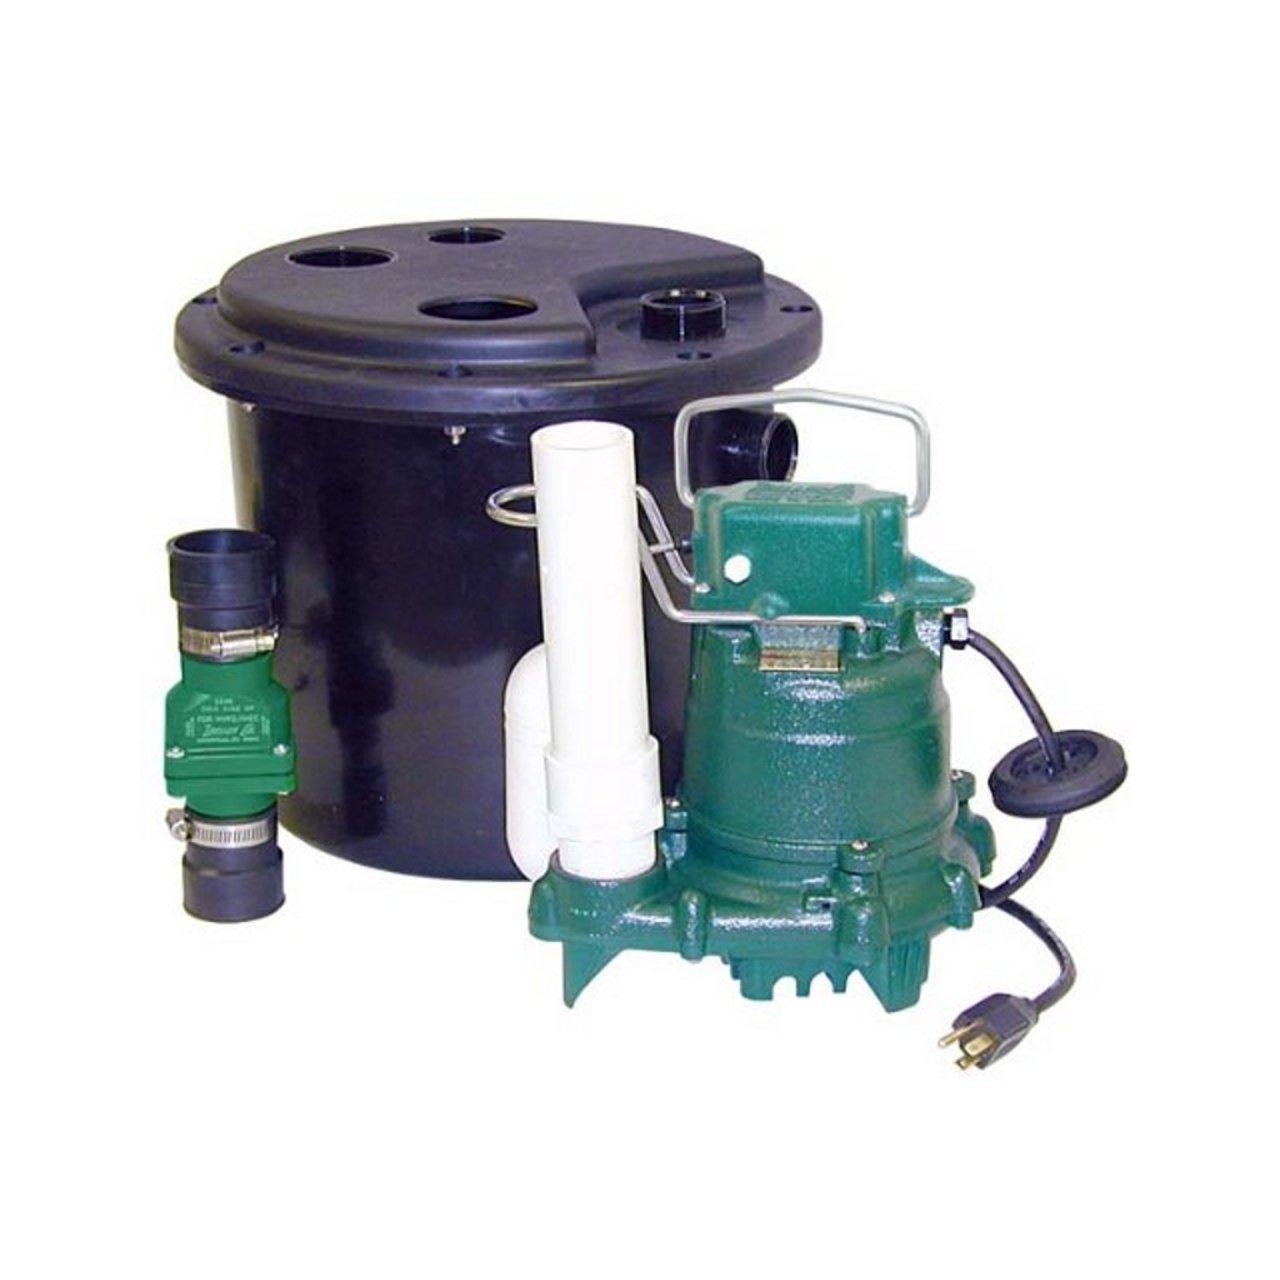 Zoeller 105-0001 Sump Pump, 12.50 x 14.50 x 14.50 inches, 19 Pound by Zoeller